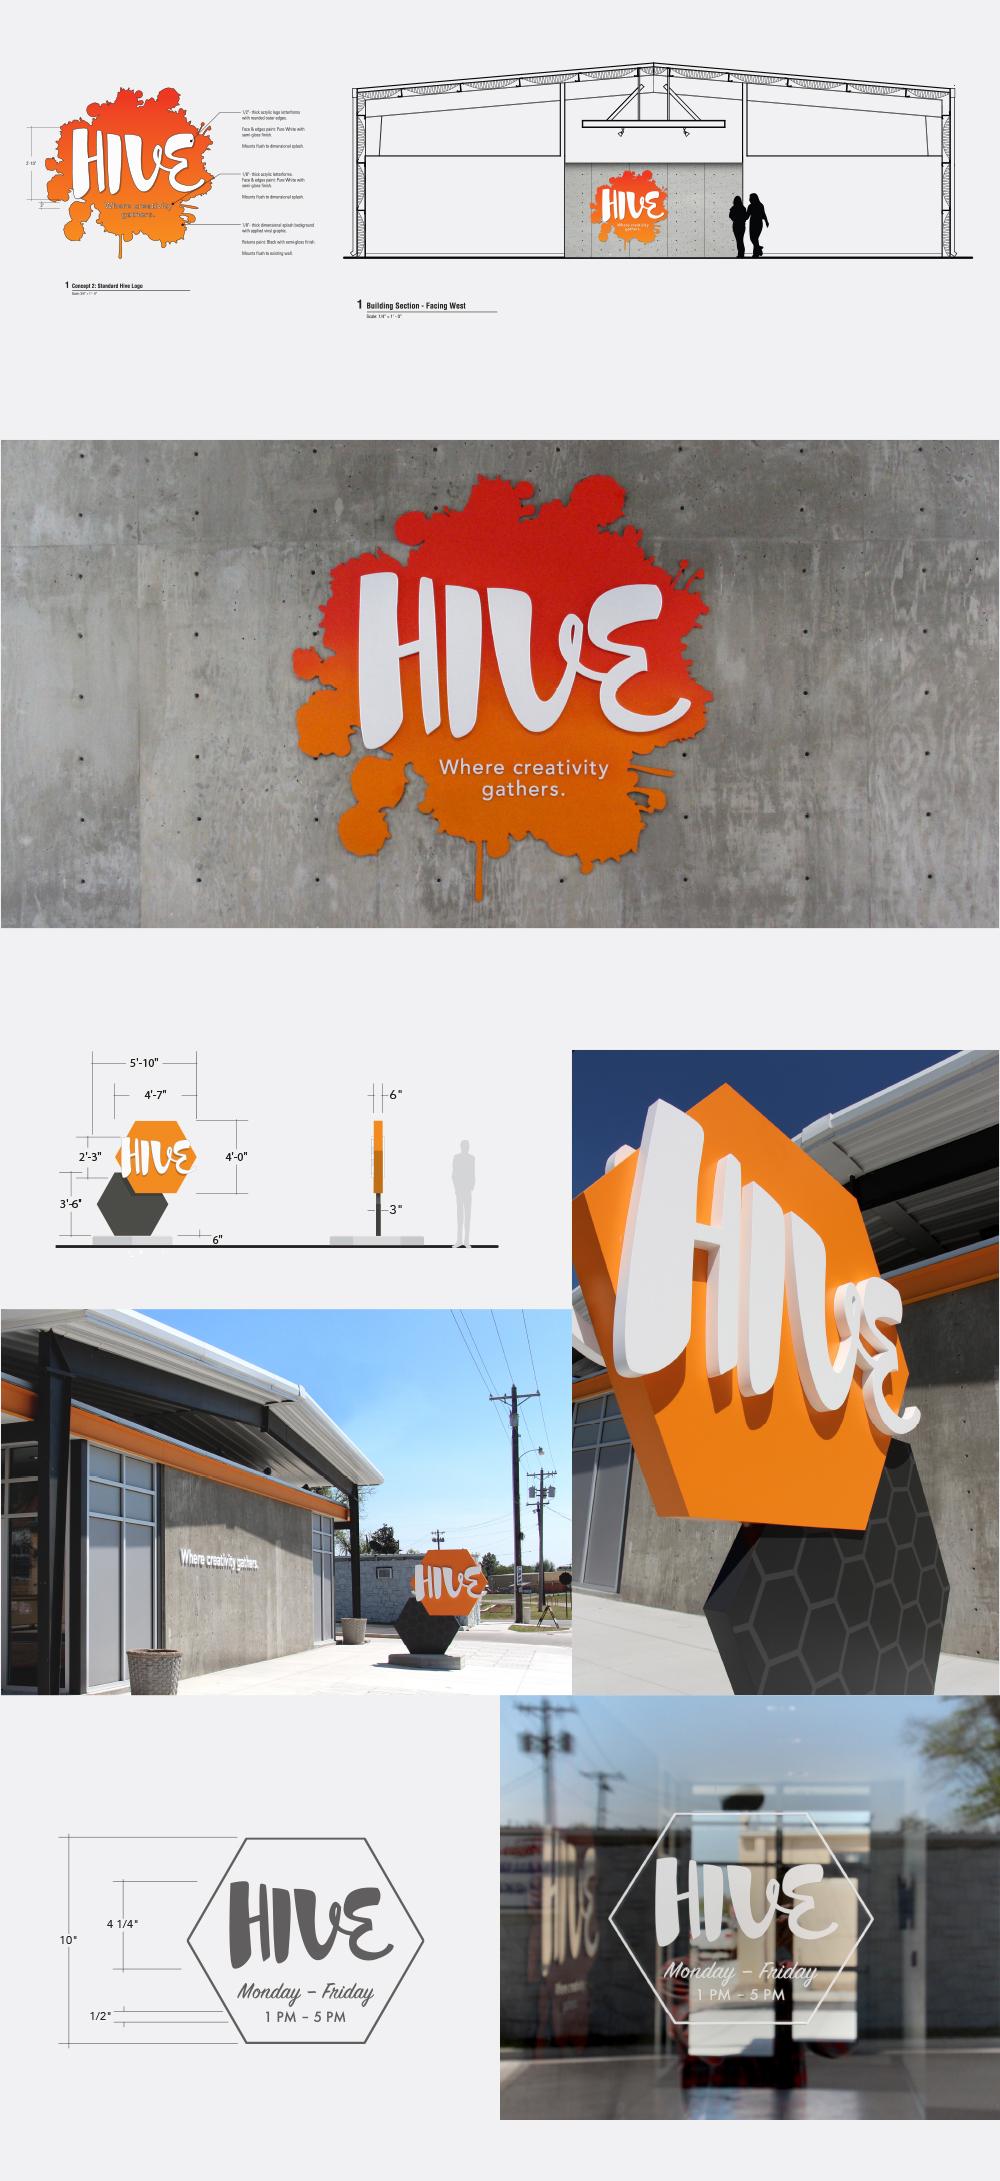 Hive_6_Signage